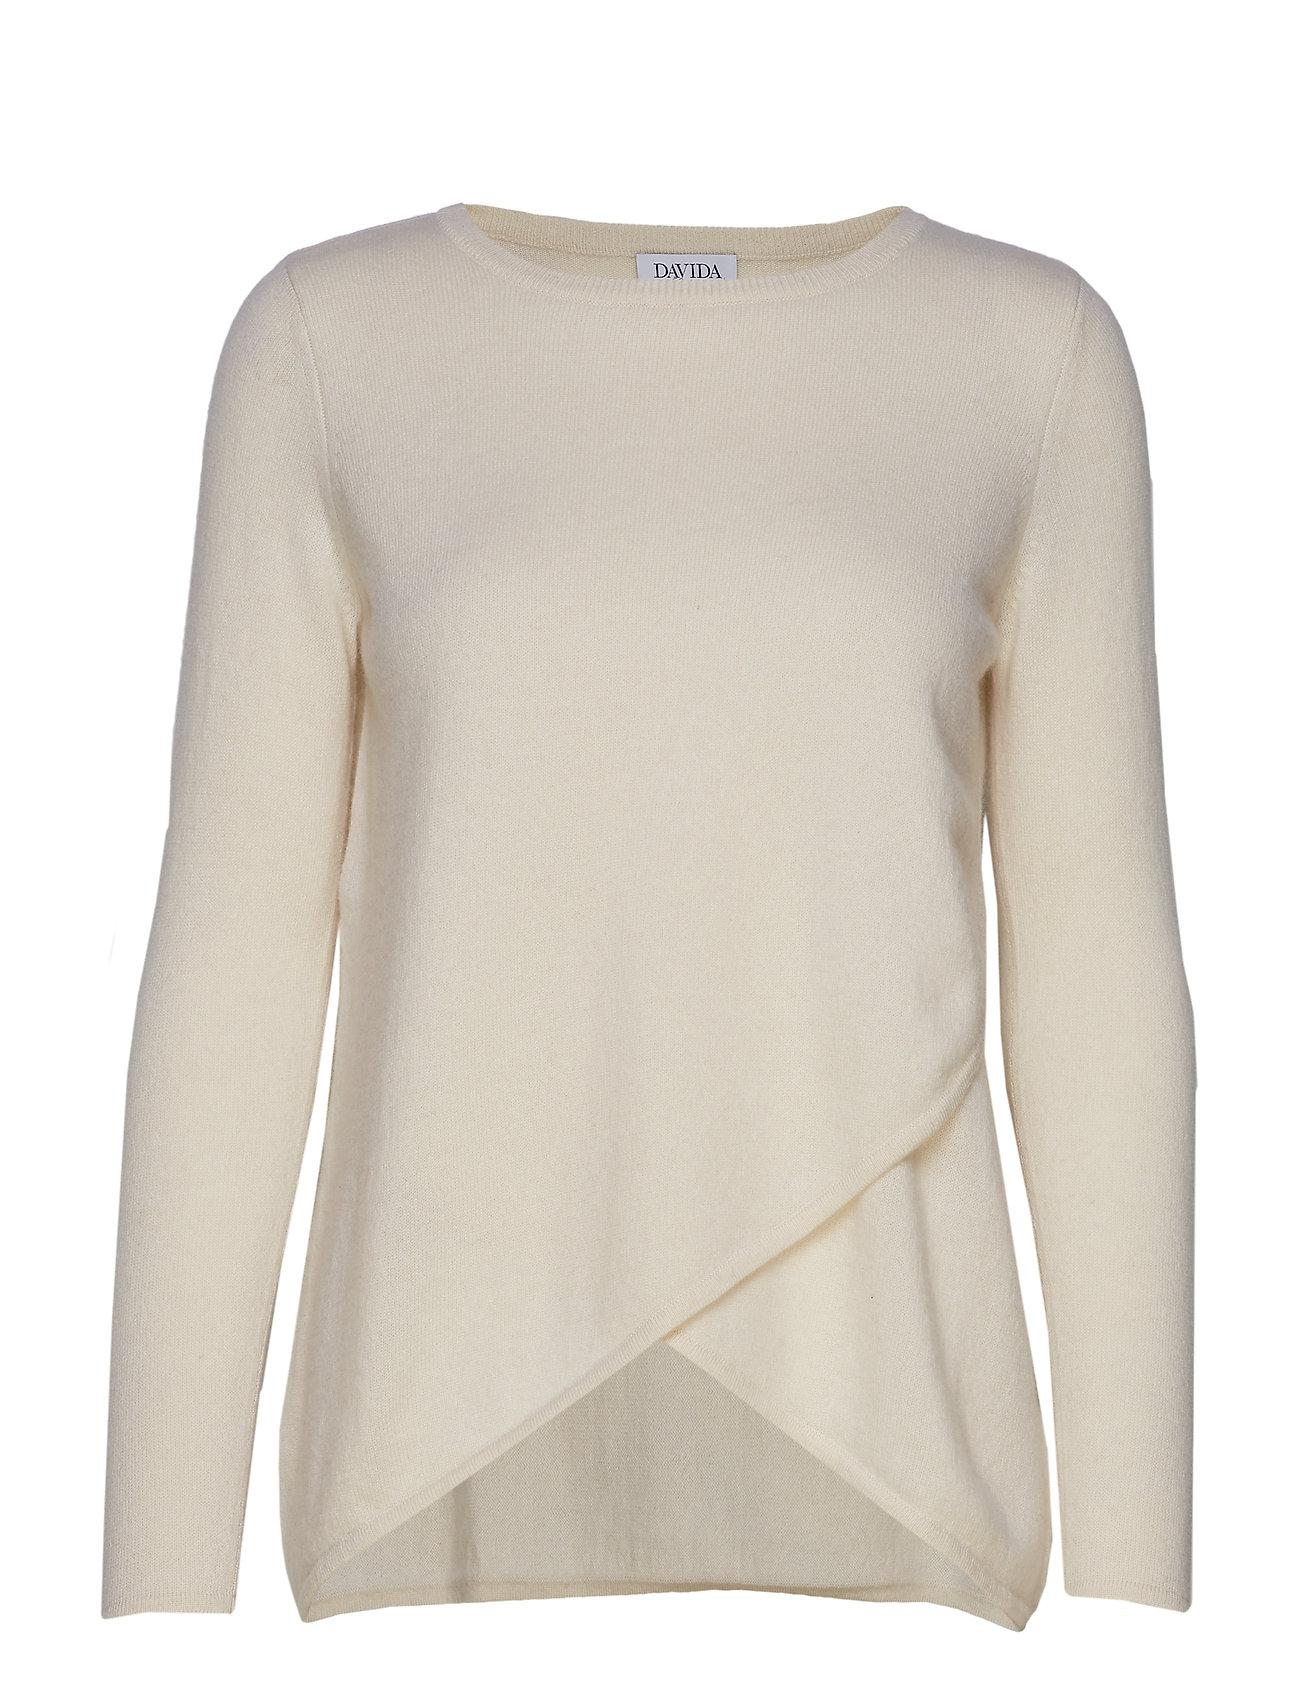 Davida Cashmere Wrap Front Sweater - WHITE